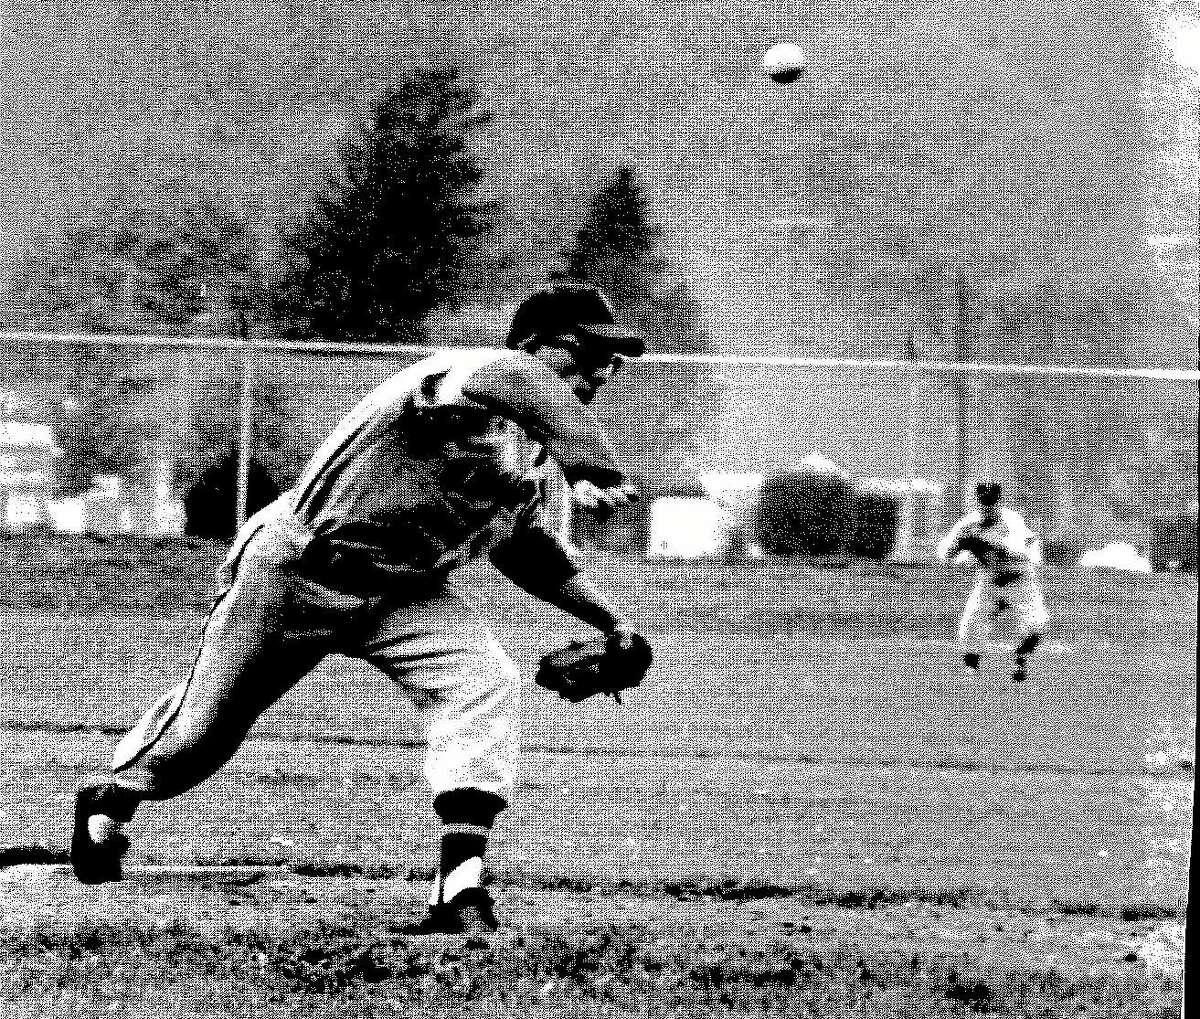 Quinnipiac baseball legend Pat DeMaio passed away last week at the age of 75.